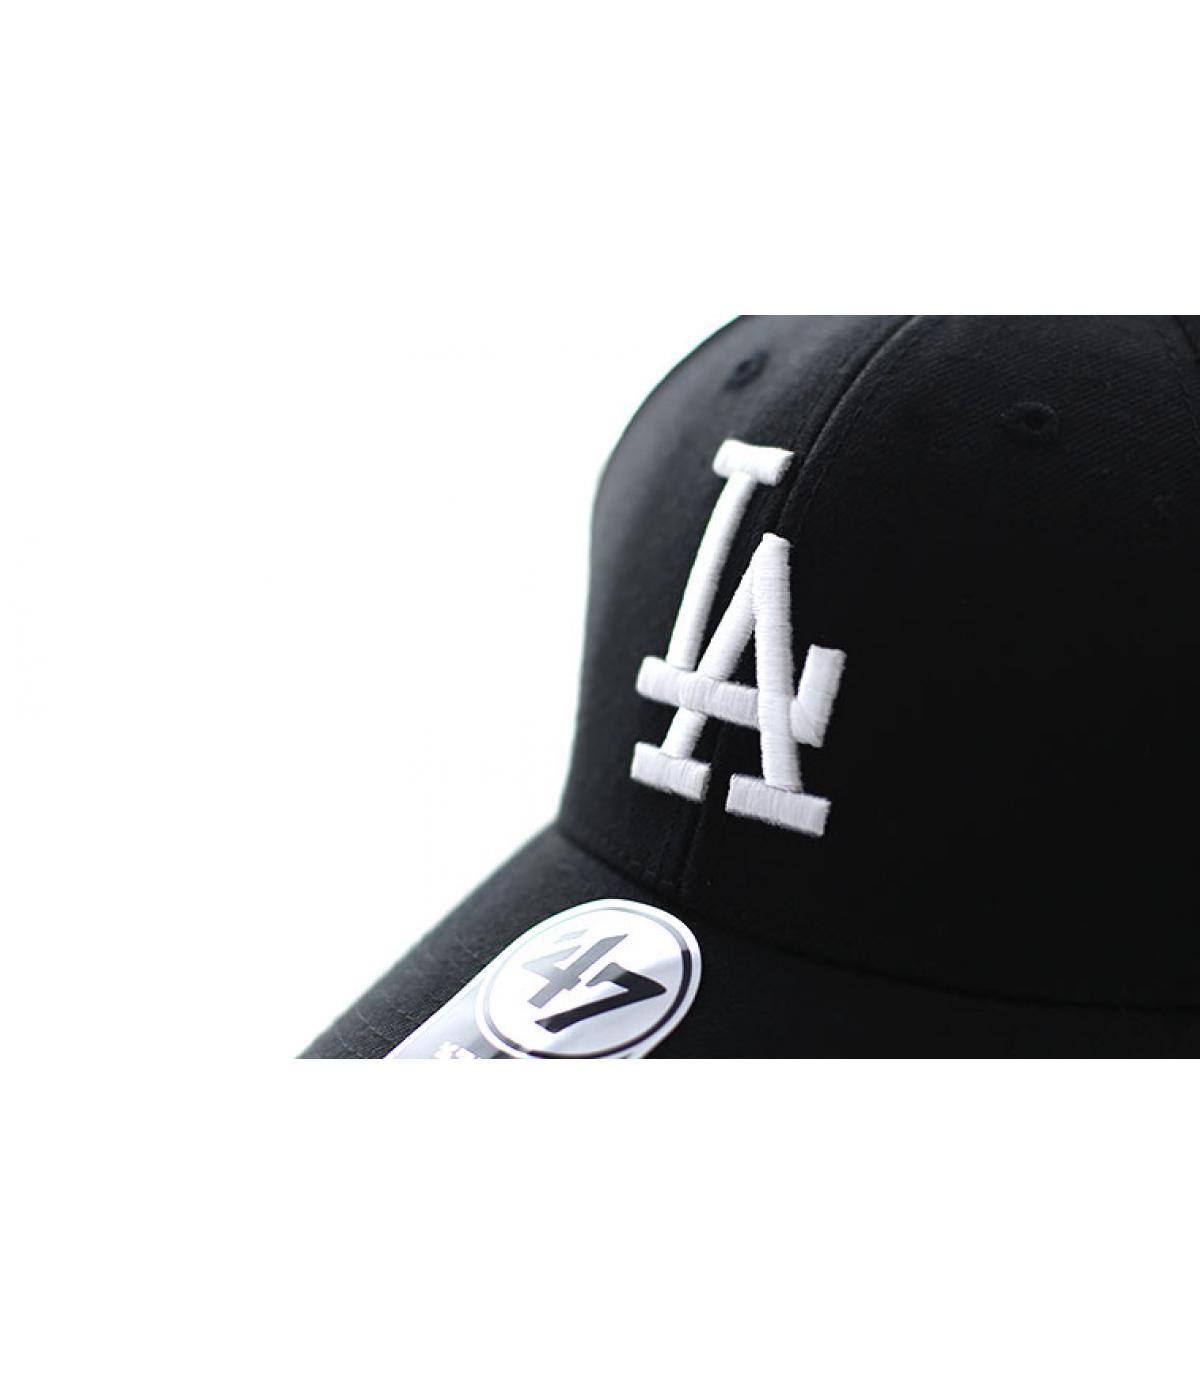 Dettagli MVP LA Dodgers black - image 3